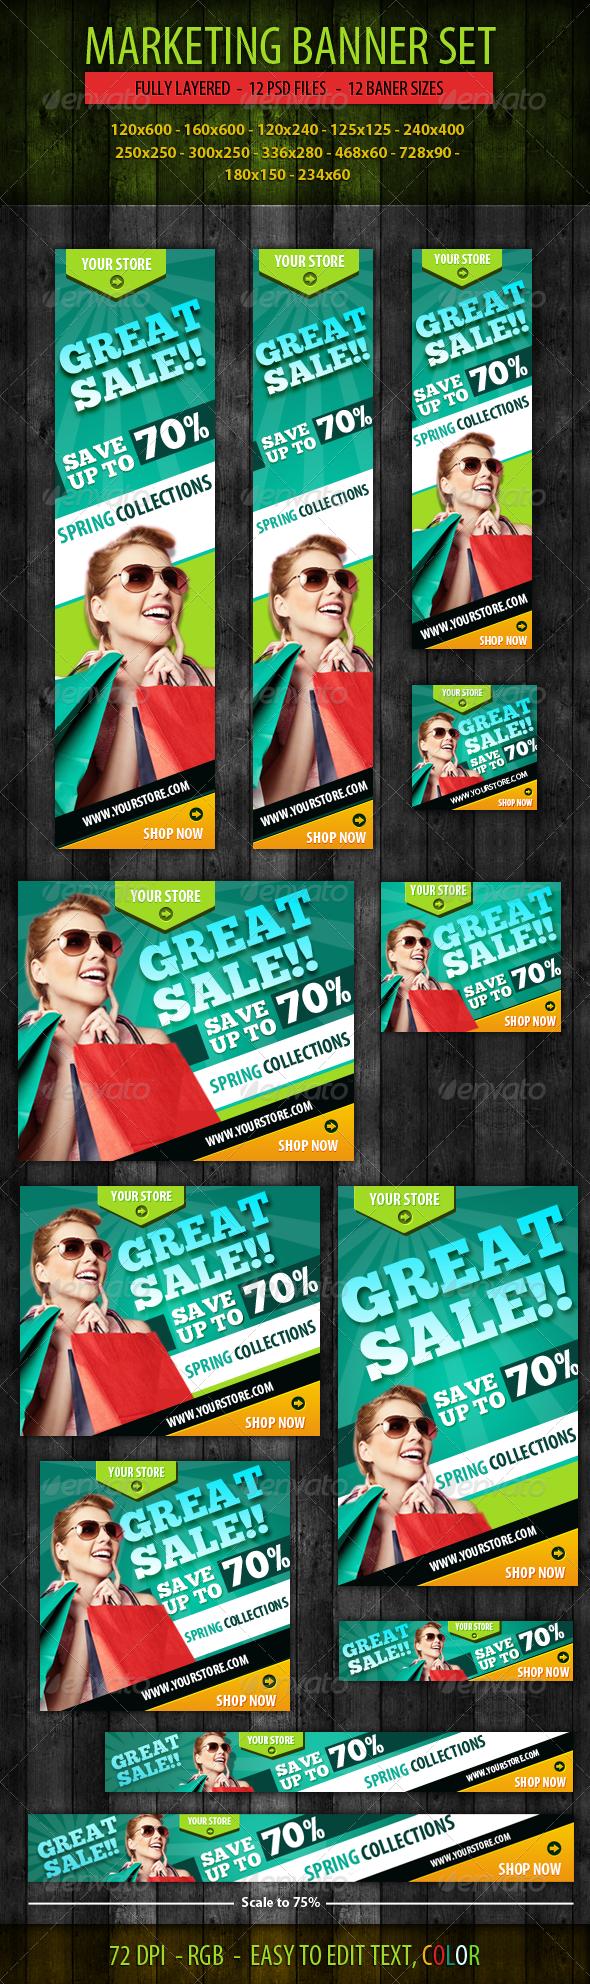 GraphicRiver Marketing Banner Set 5056359